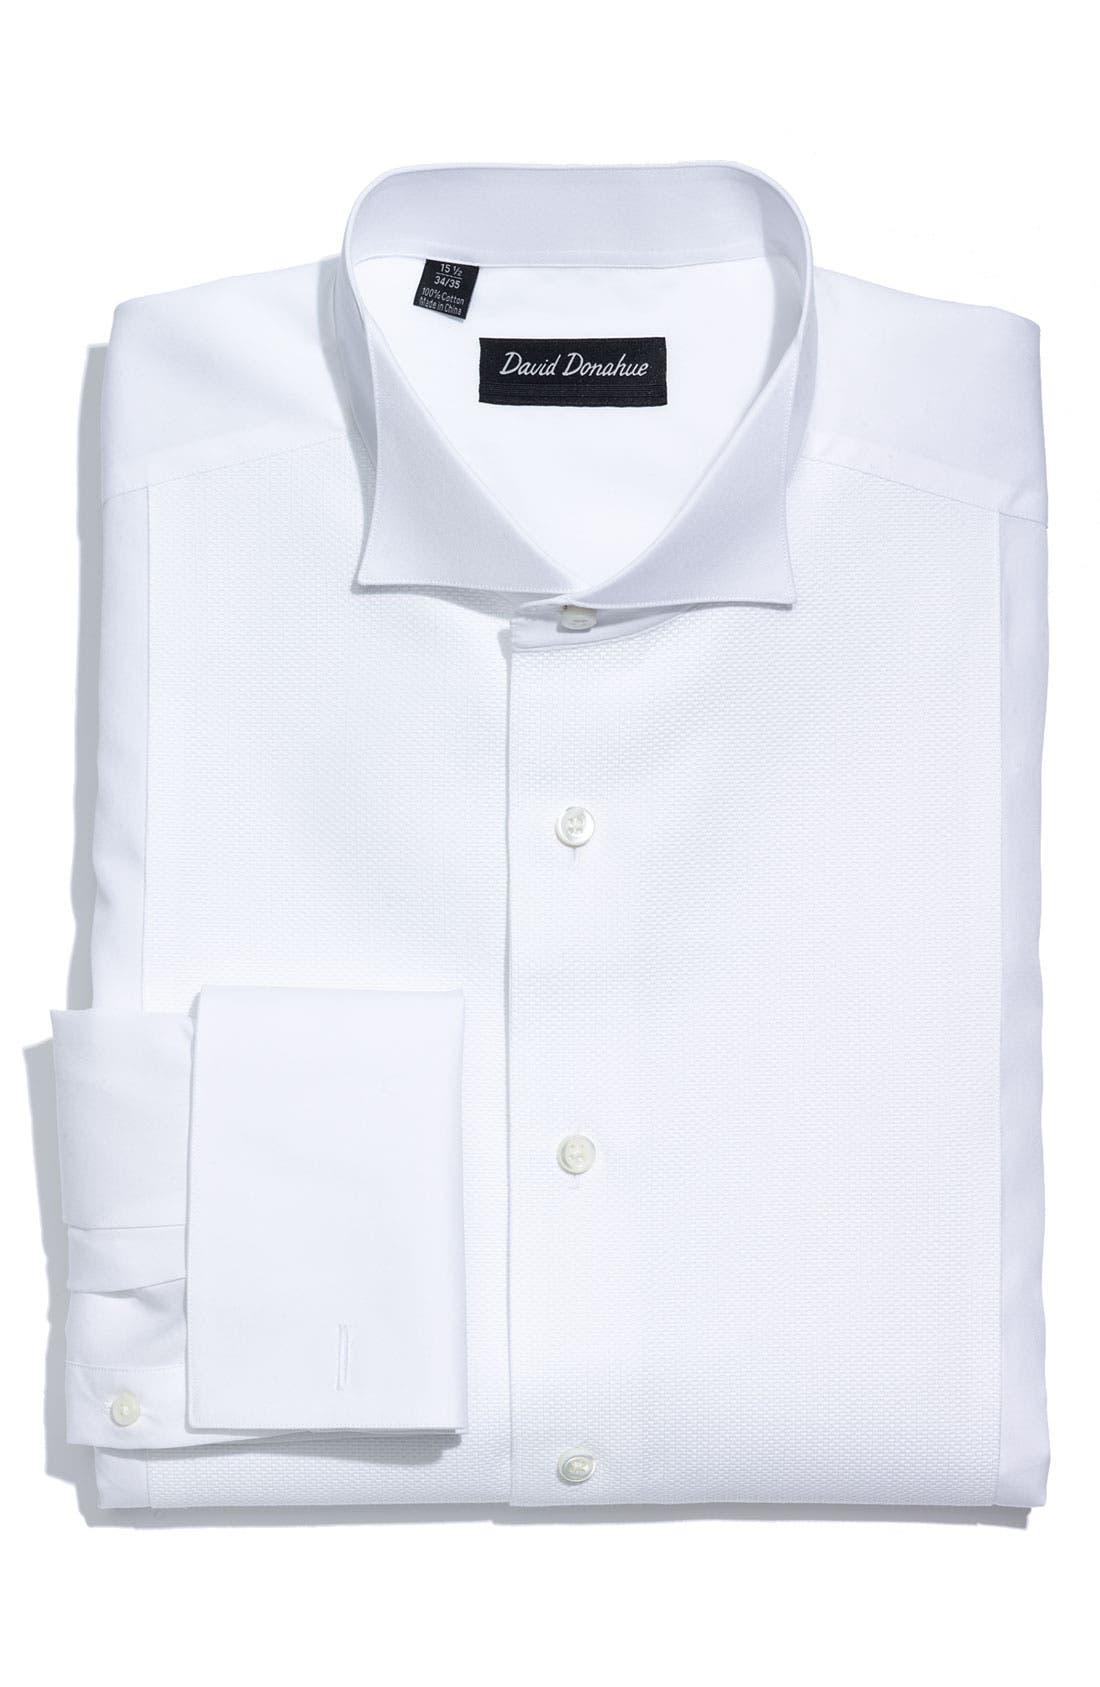 David Donahue Regular Fit Bib Front French Cuff Tuxedo Shirt